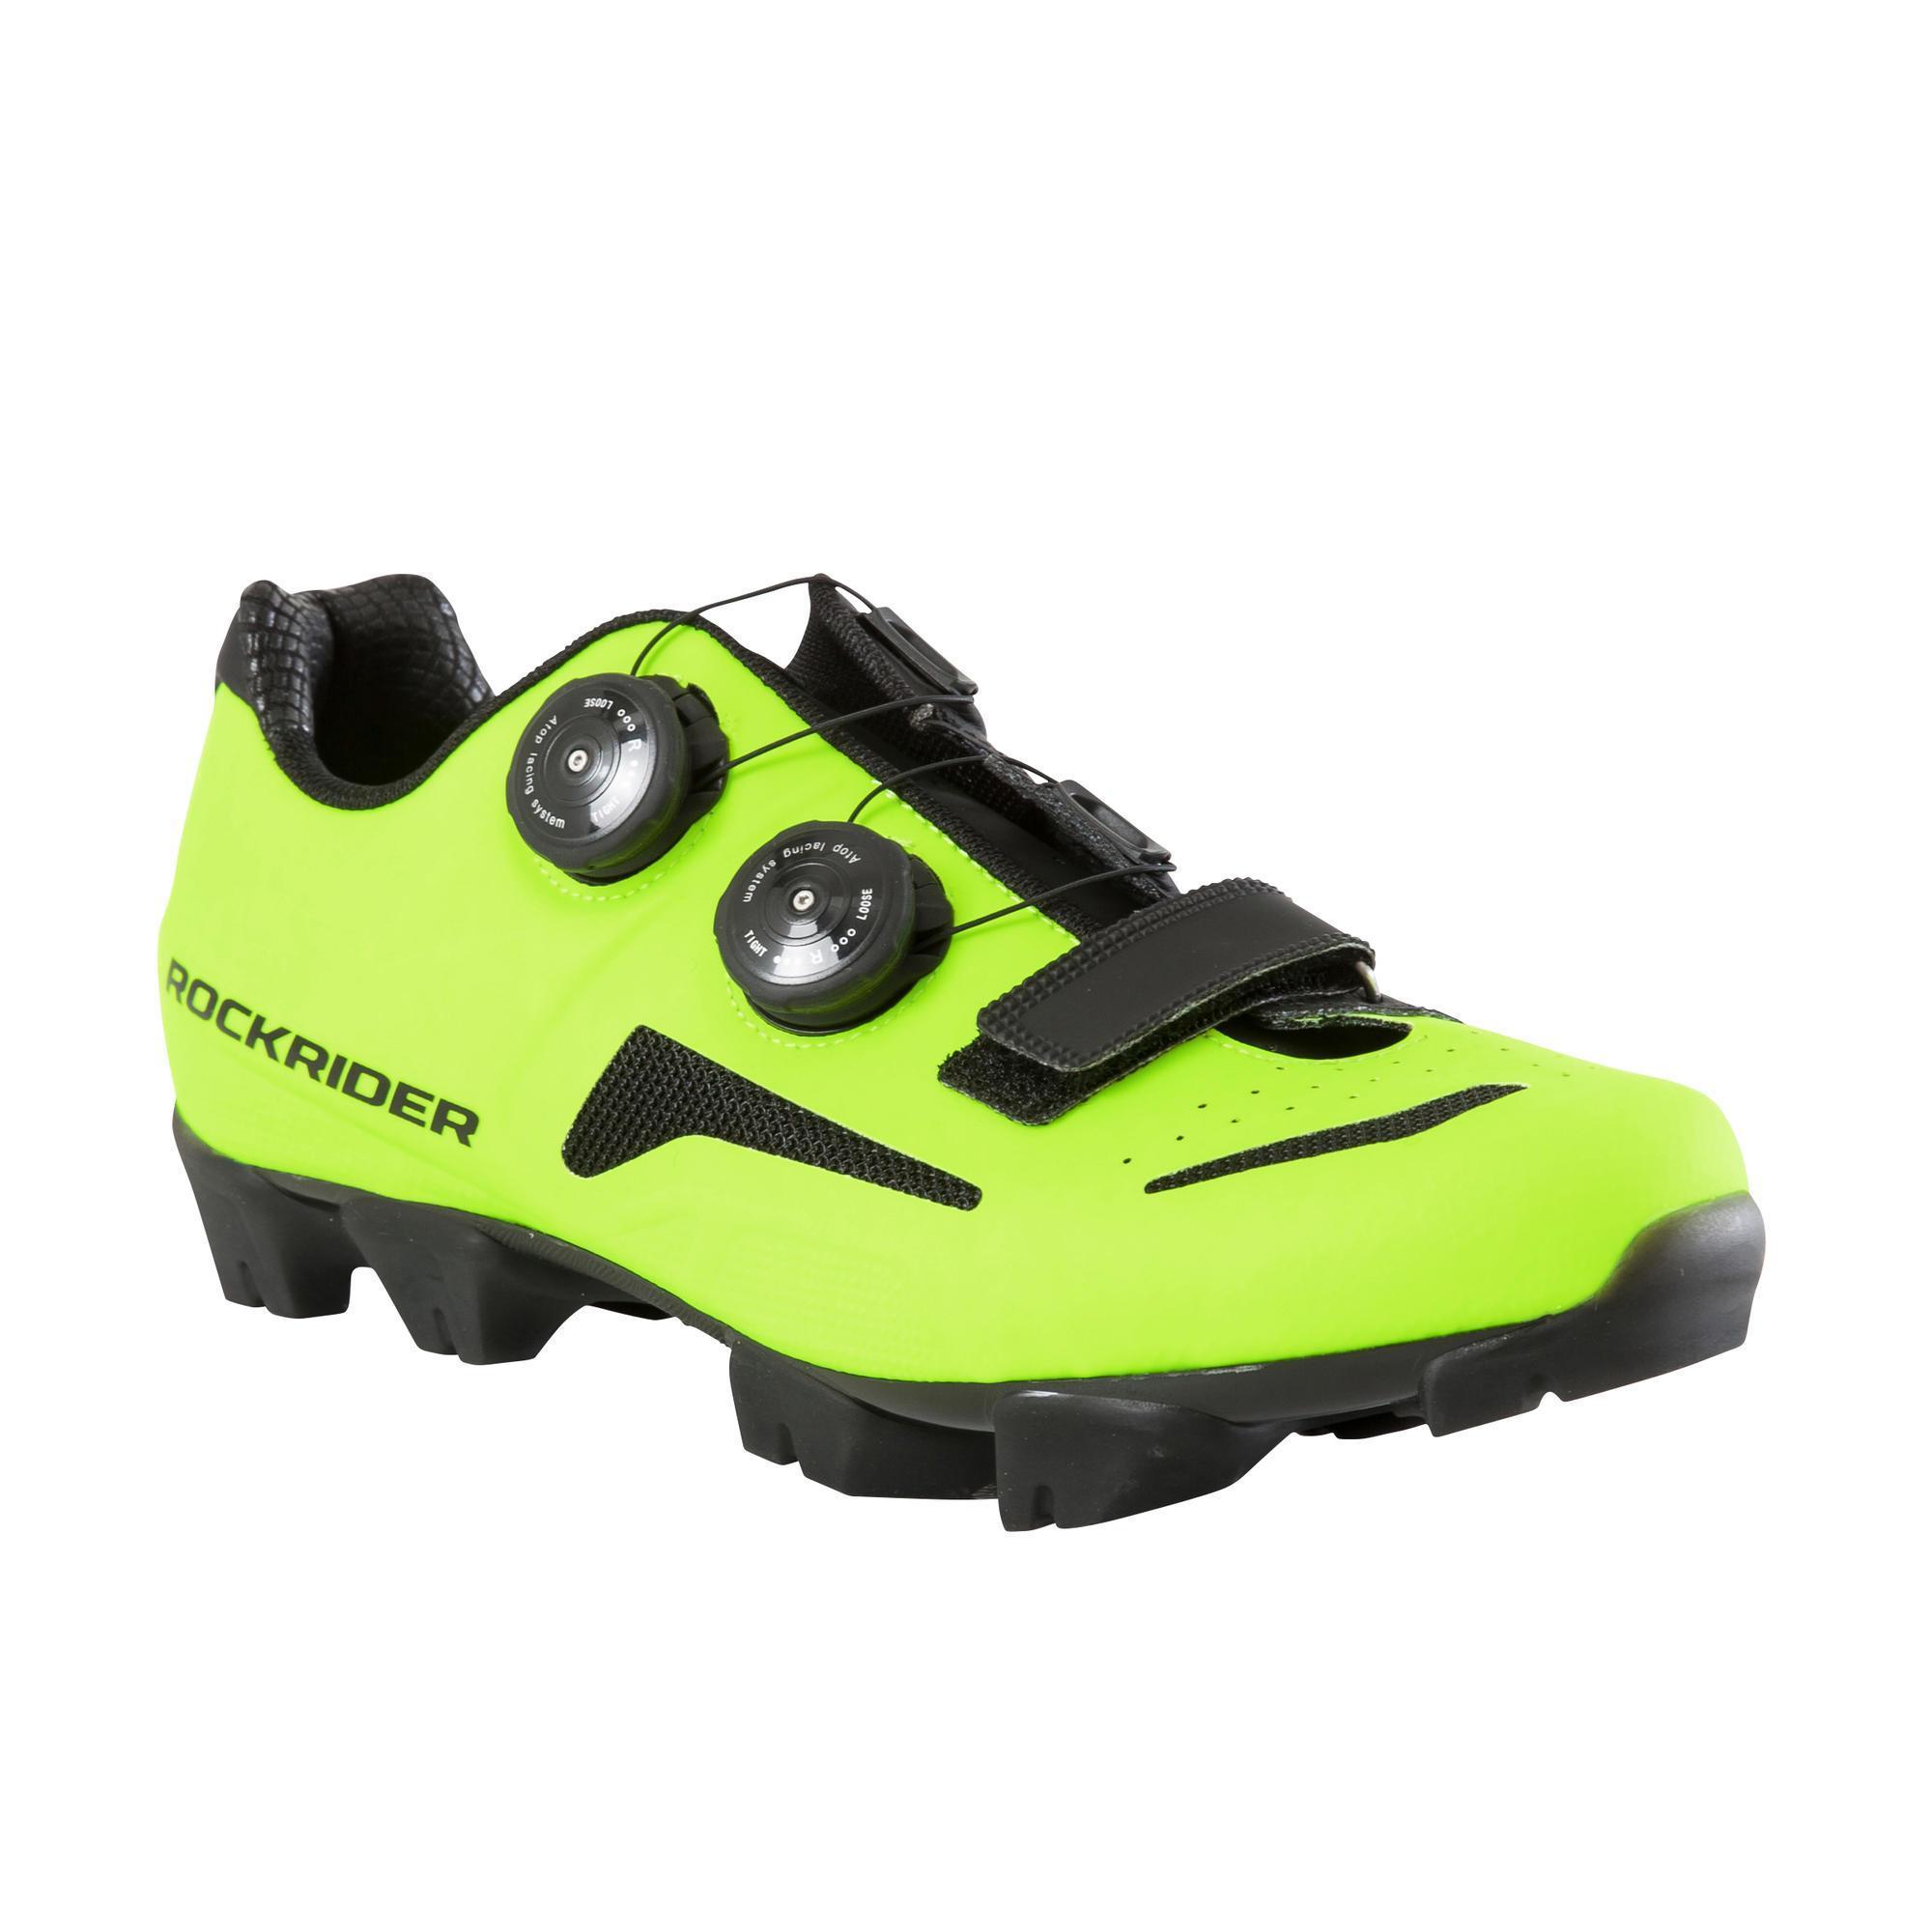 Rockrider MTB-schoenen XC 500 kopen